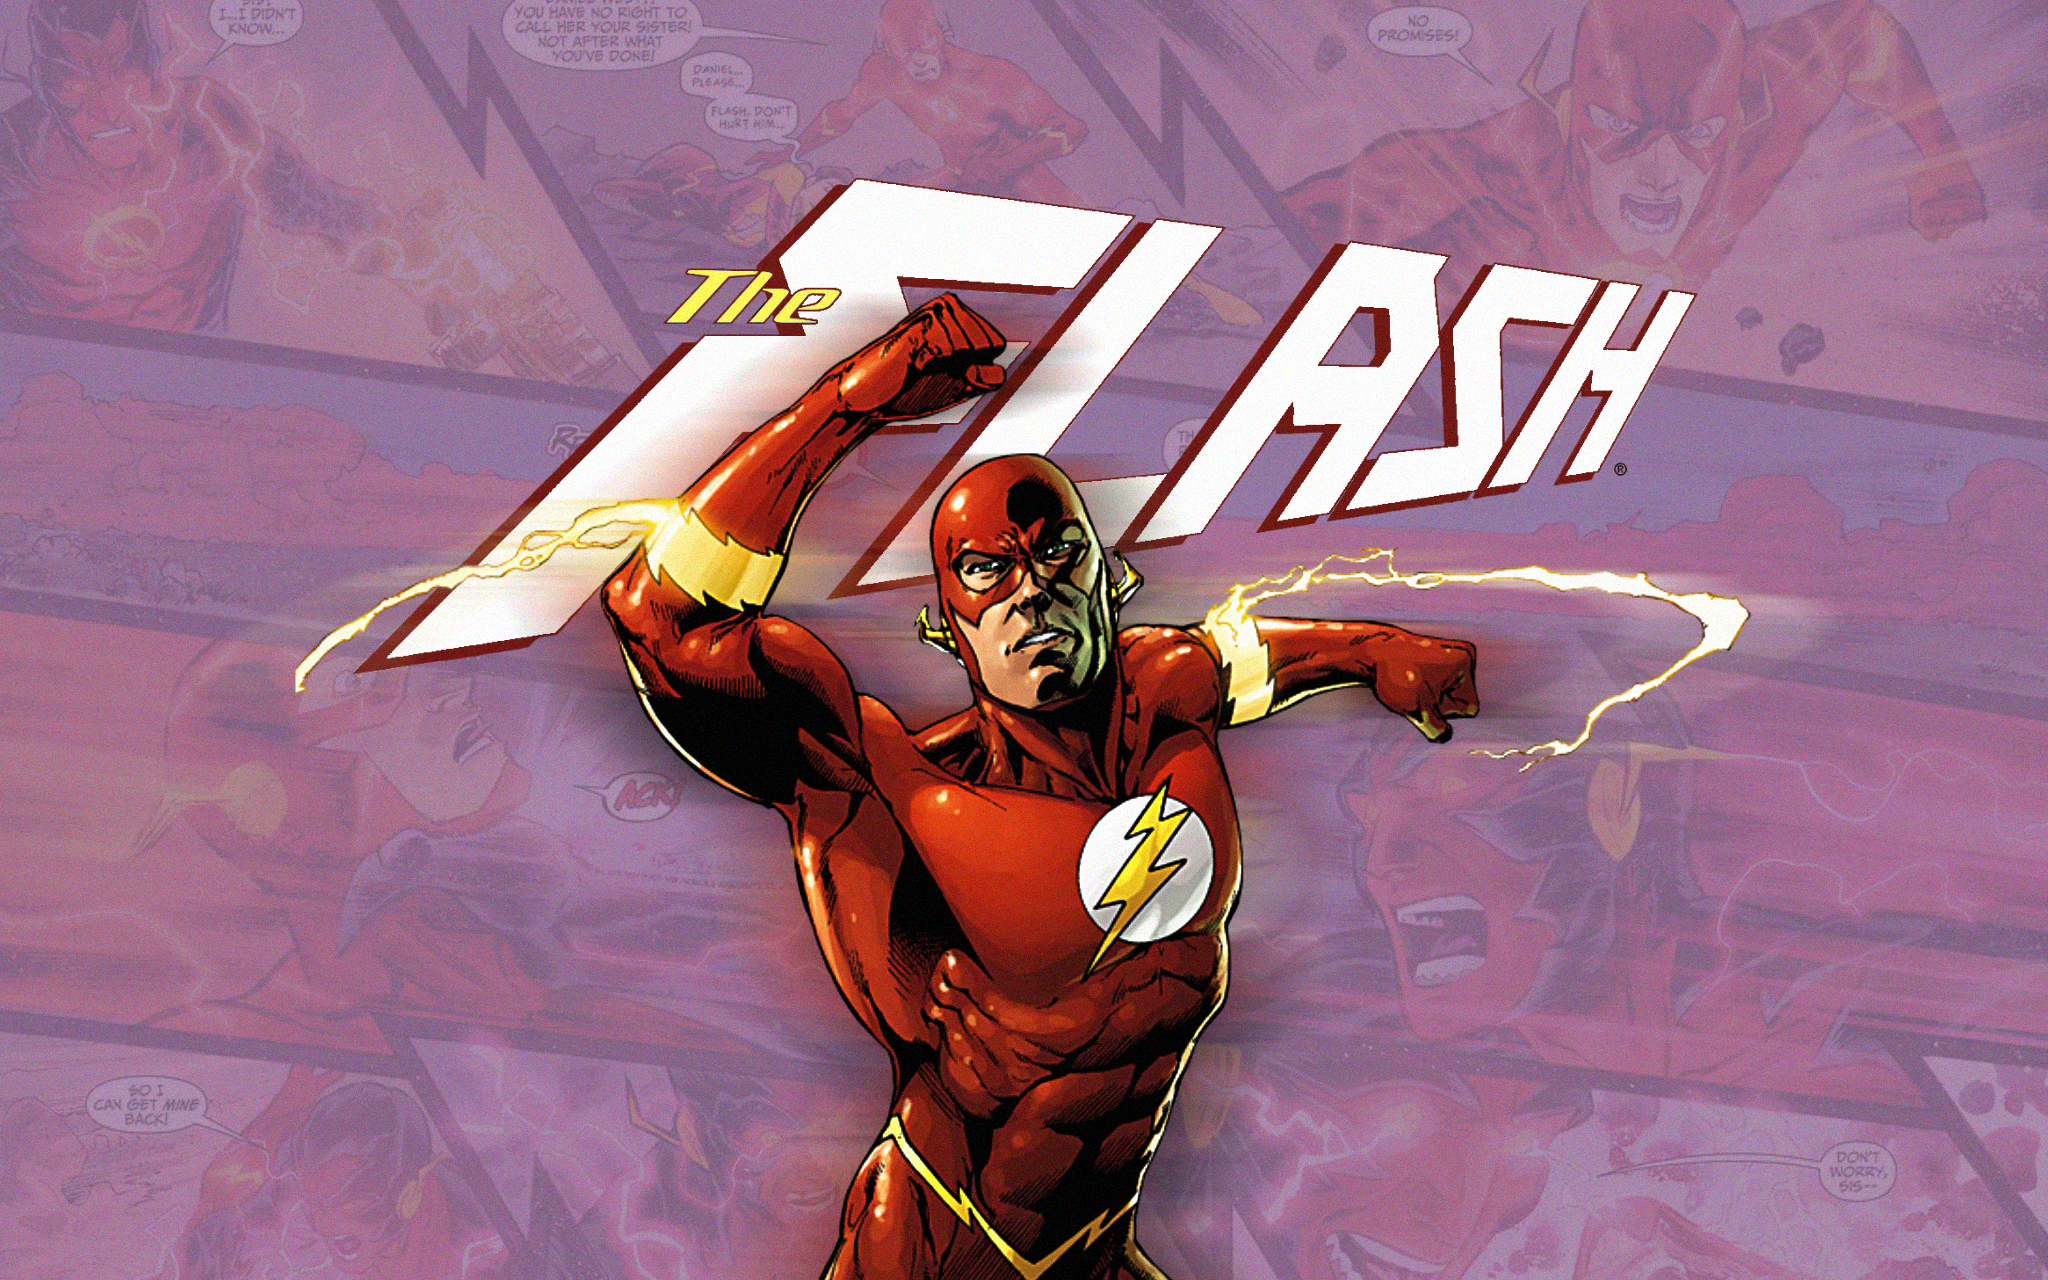 Pictures Heroes comics The Flash hero Men film superheroes Man Movies